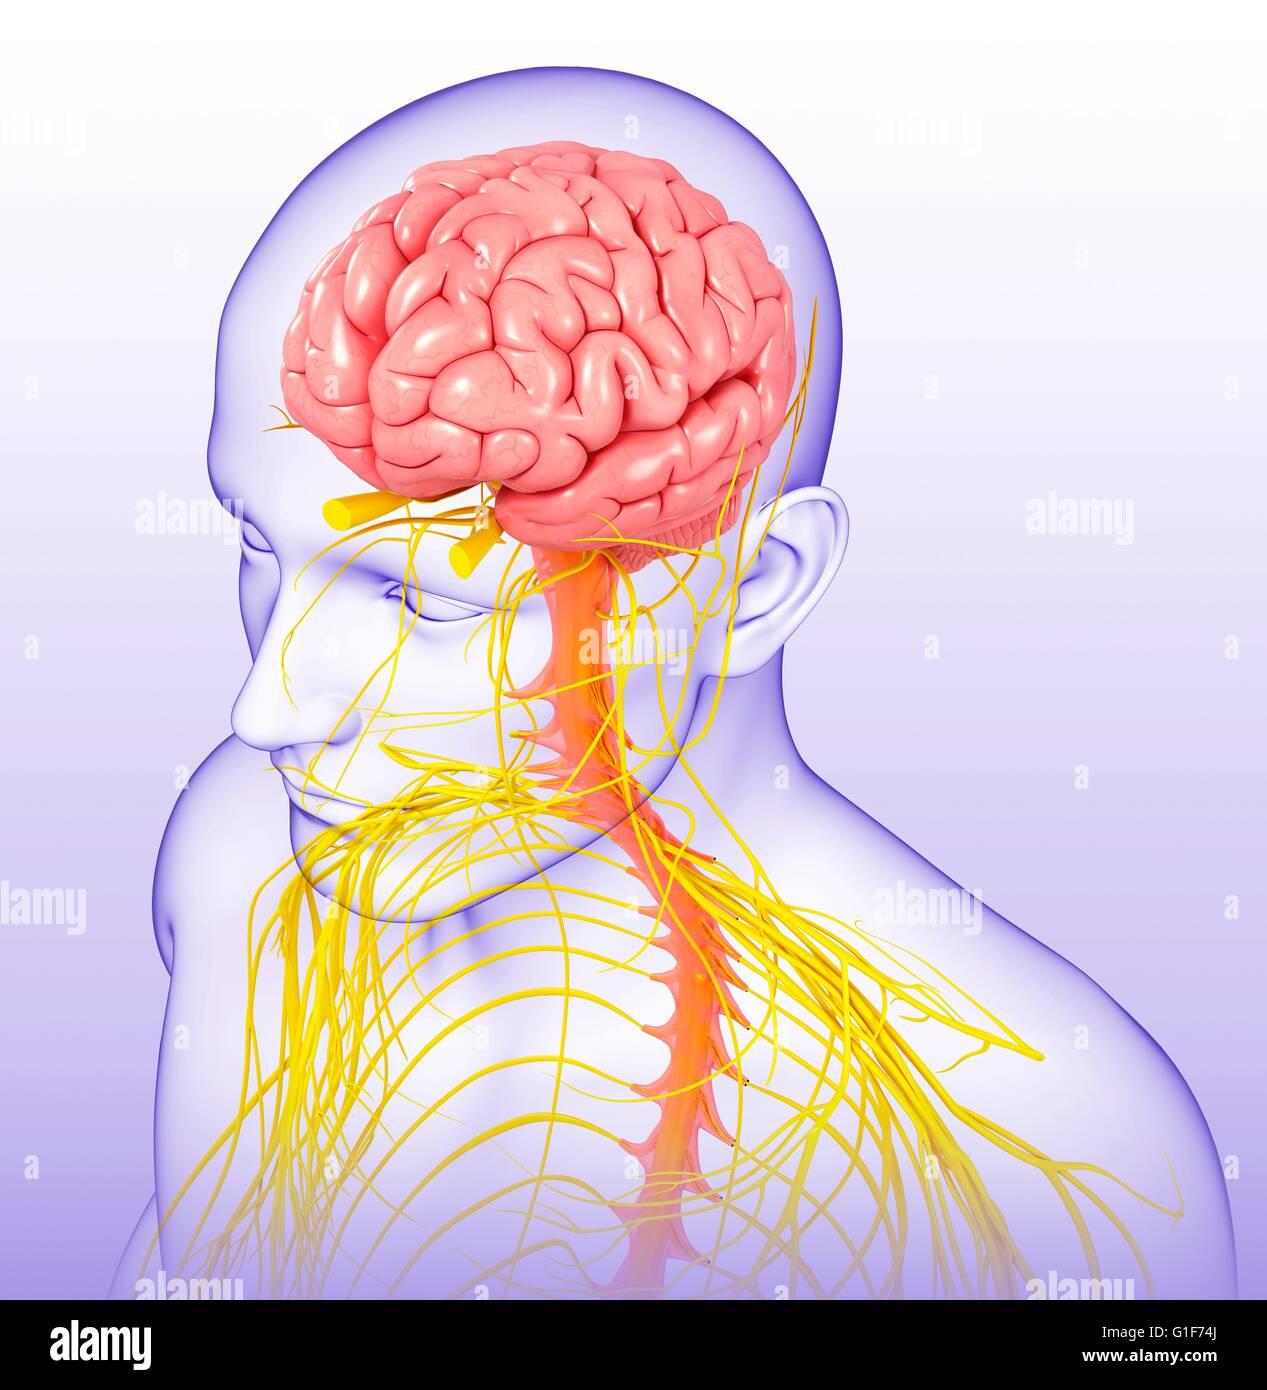 Spinal Cord Brain Anatomy 3d Stockfotos Spinal Cord Brain Anatomy